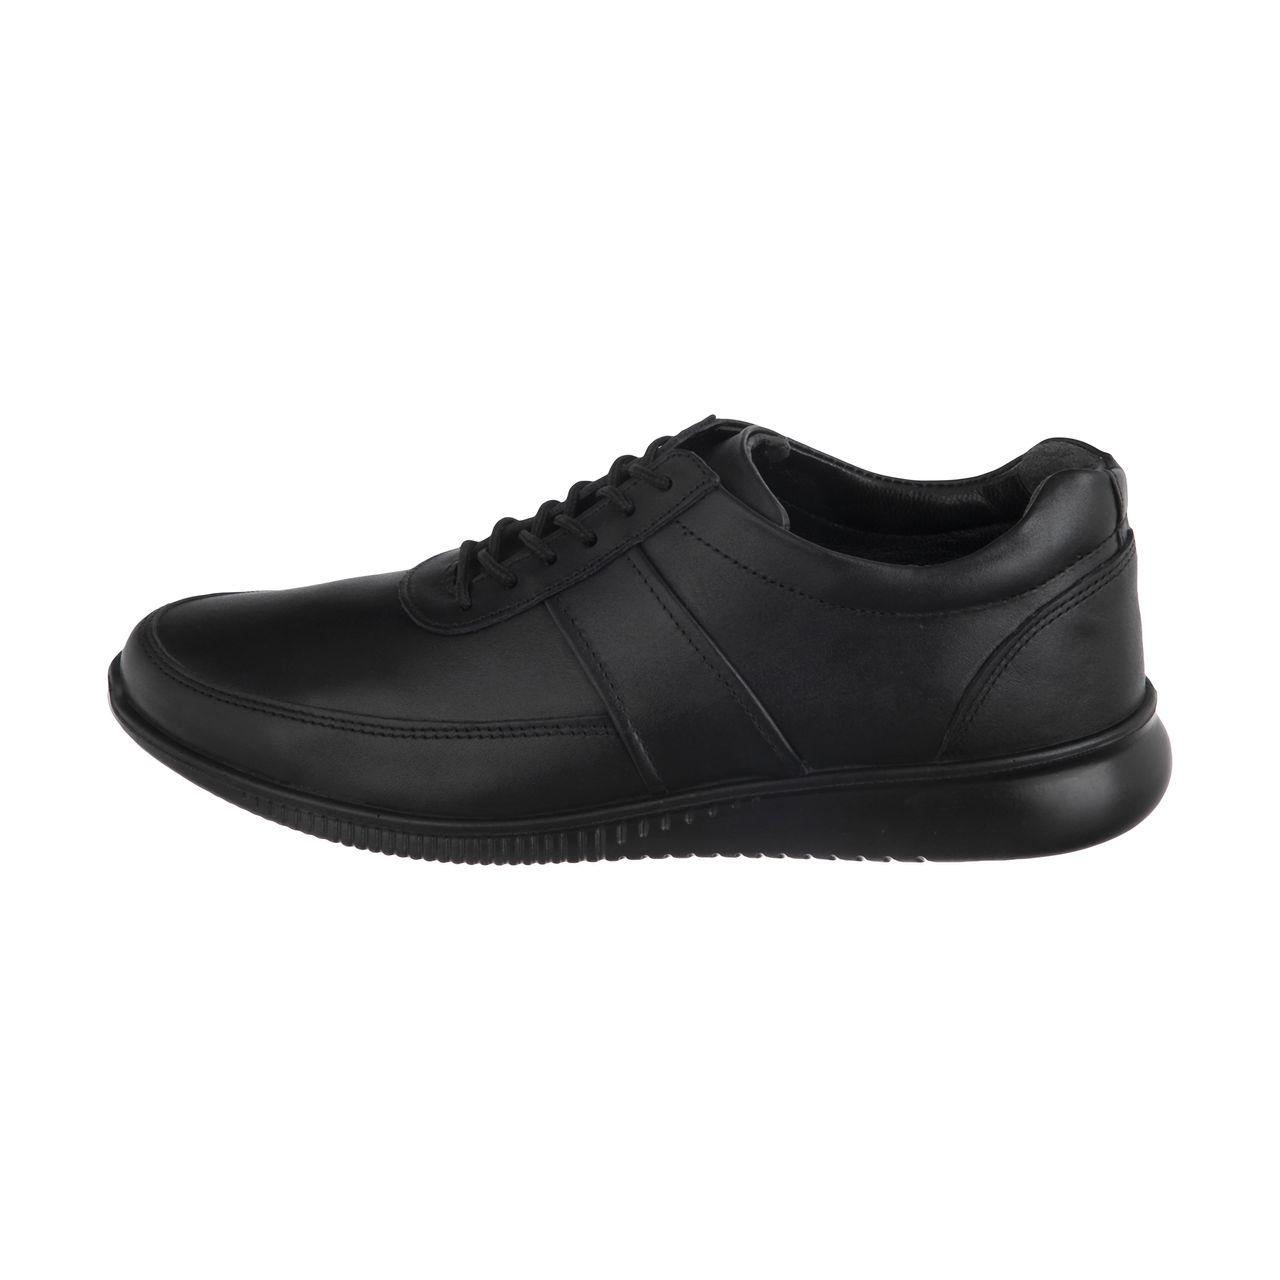 کفش روزمره زنانه شیفر مدل 5330A103